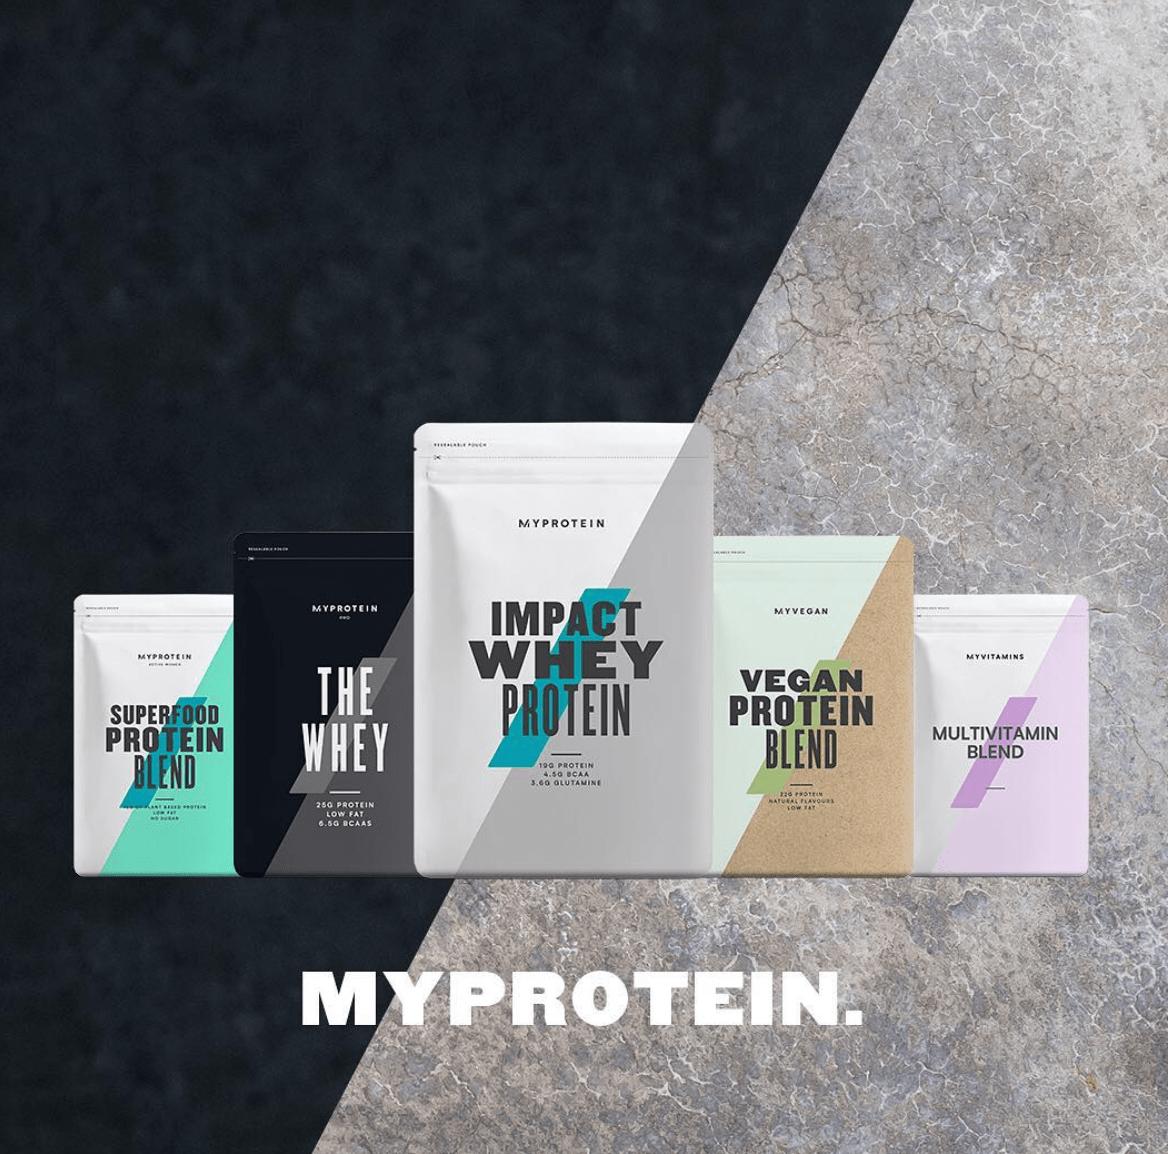 myprotein rebrand.png